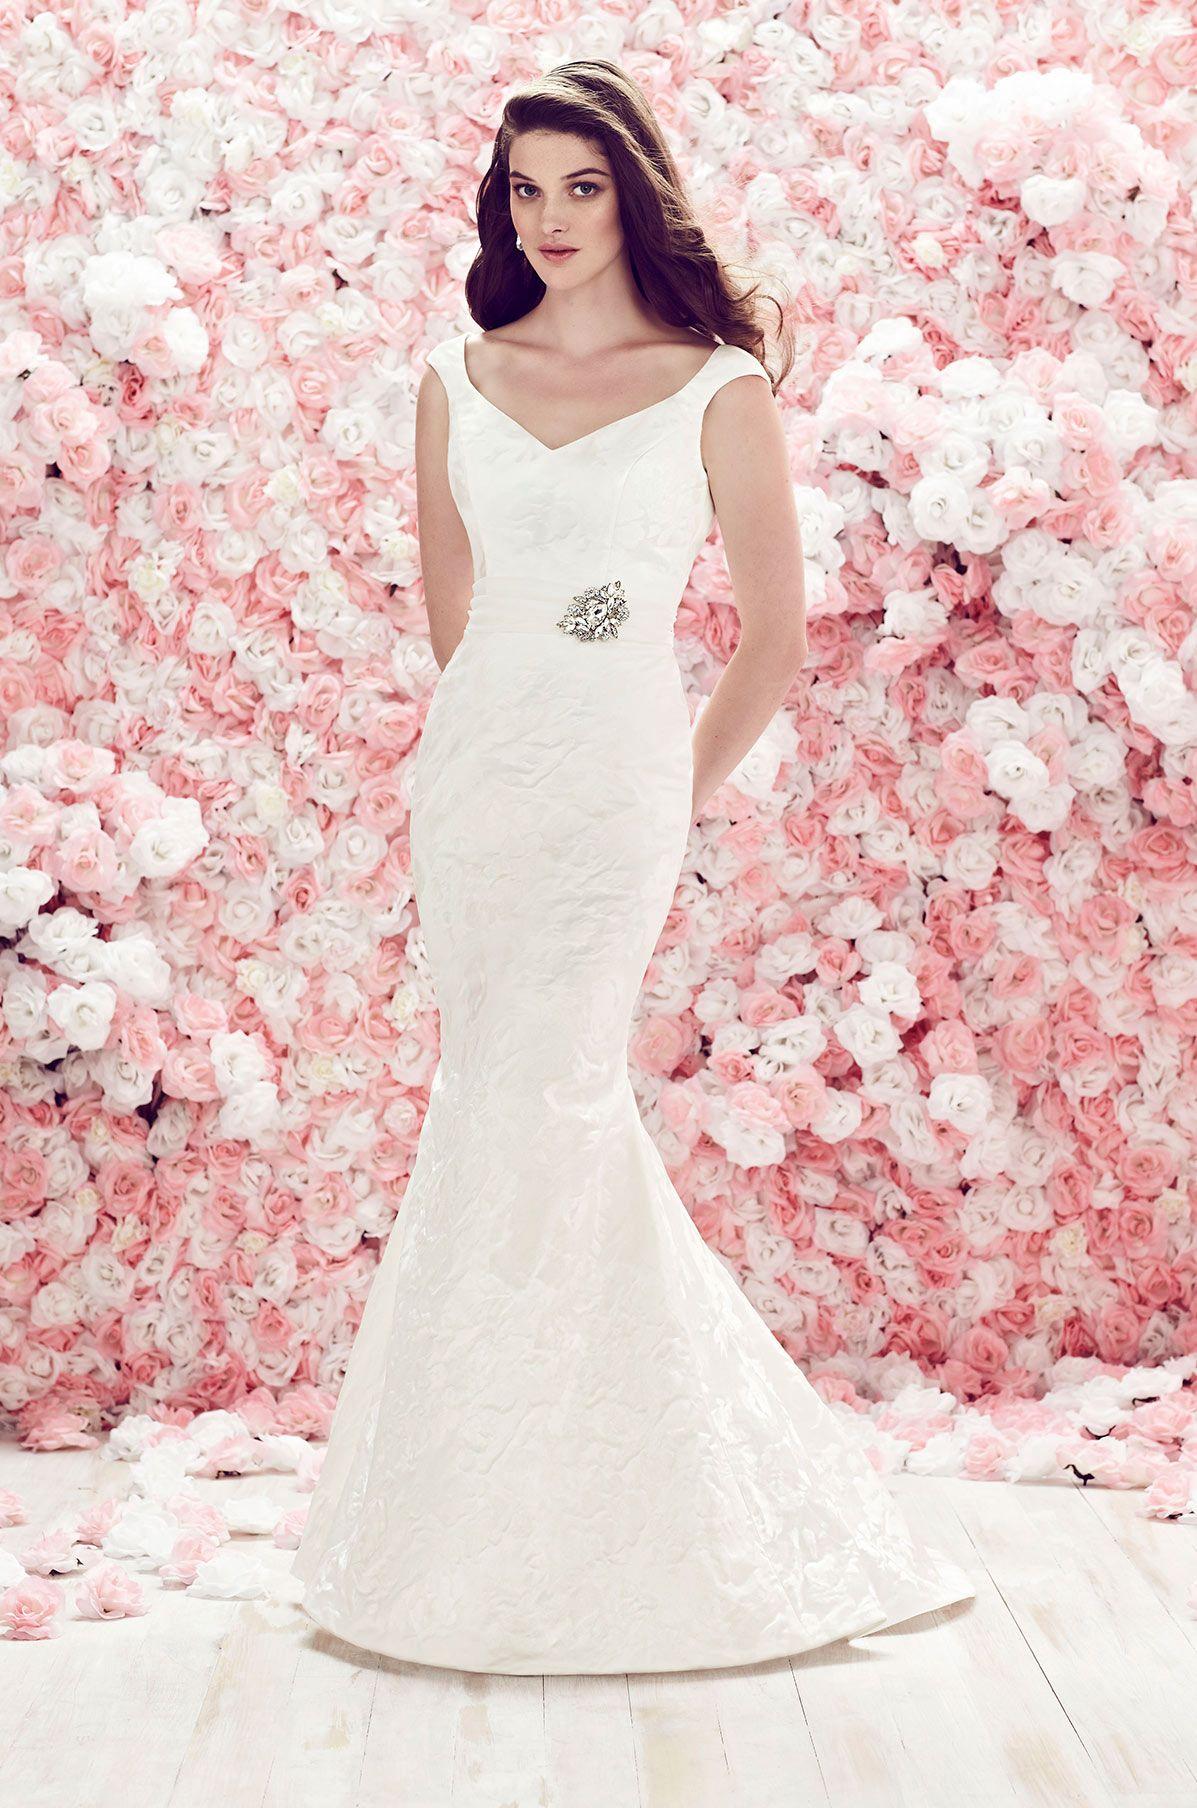 Fitted Brocade Wedding Dress - Style #1862 | Mikaella bridal, Dress ...